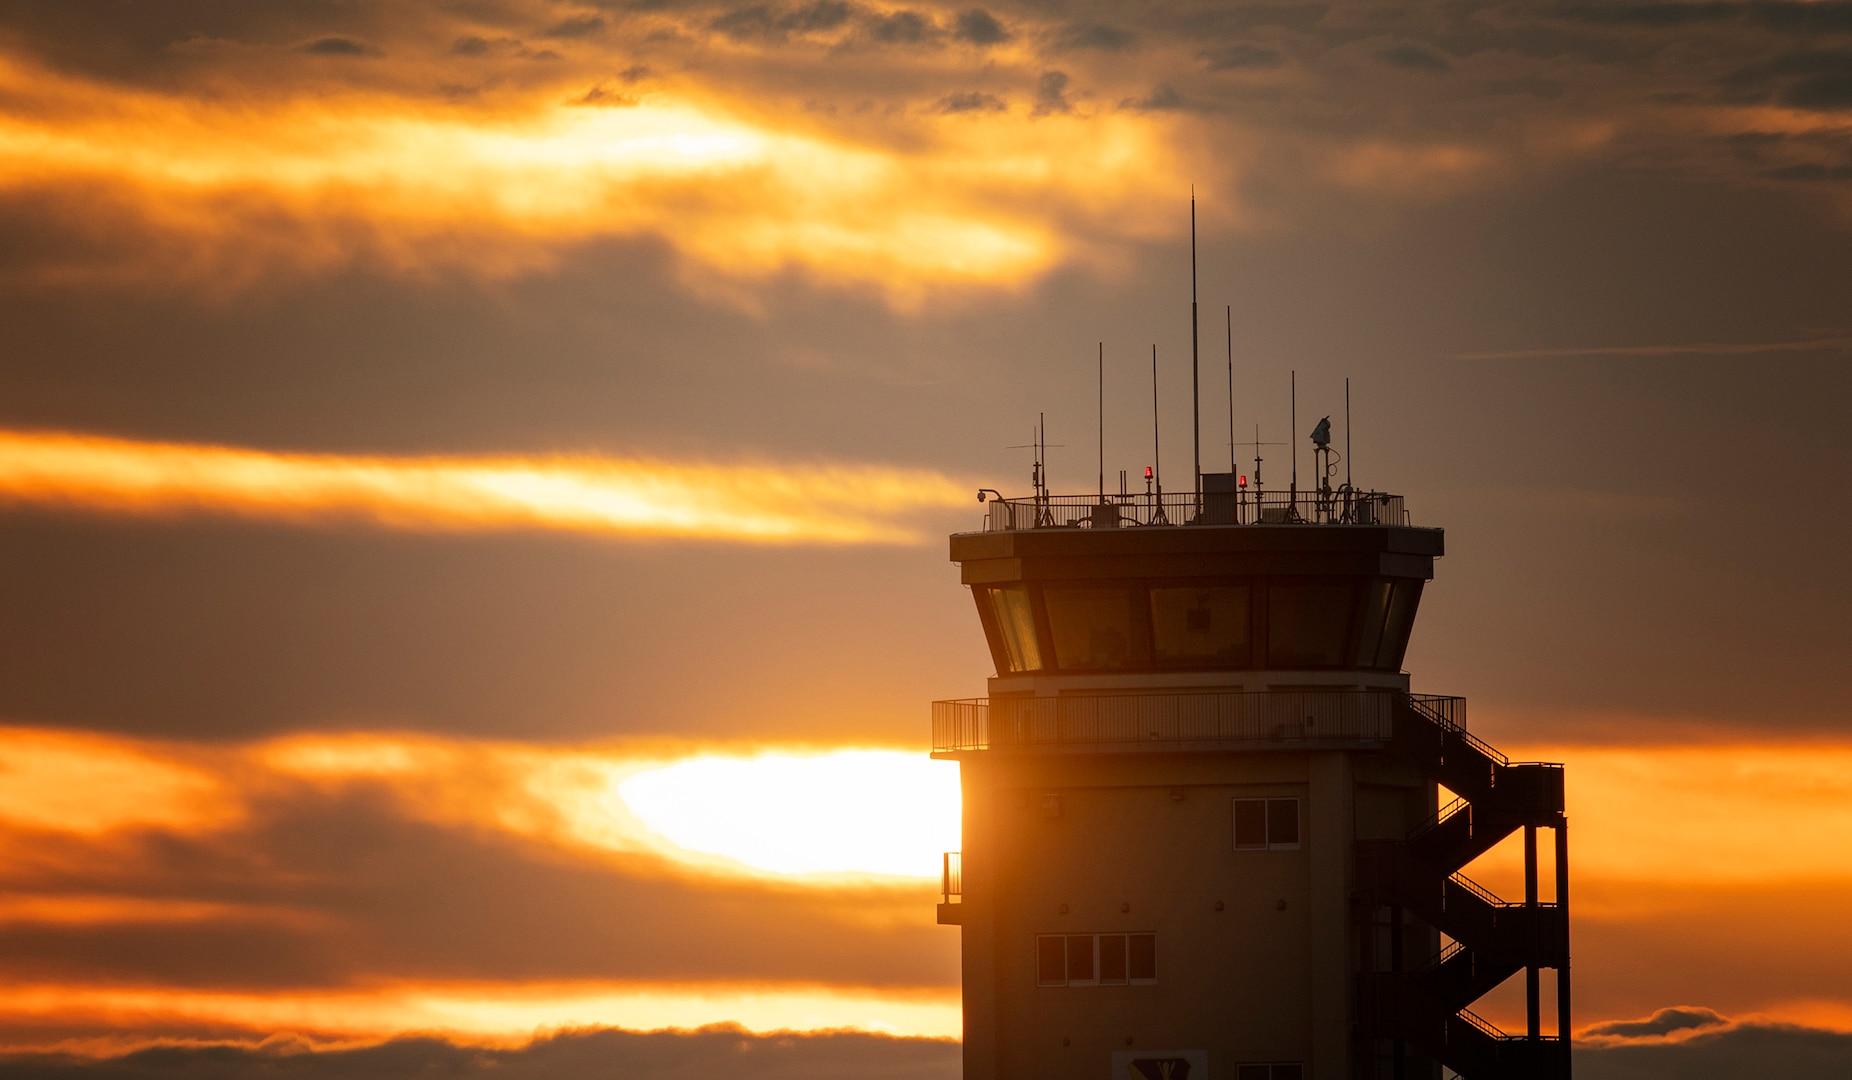 Yokota Air Traffic Control: Controlling Traffic in the Sky